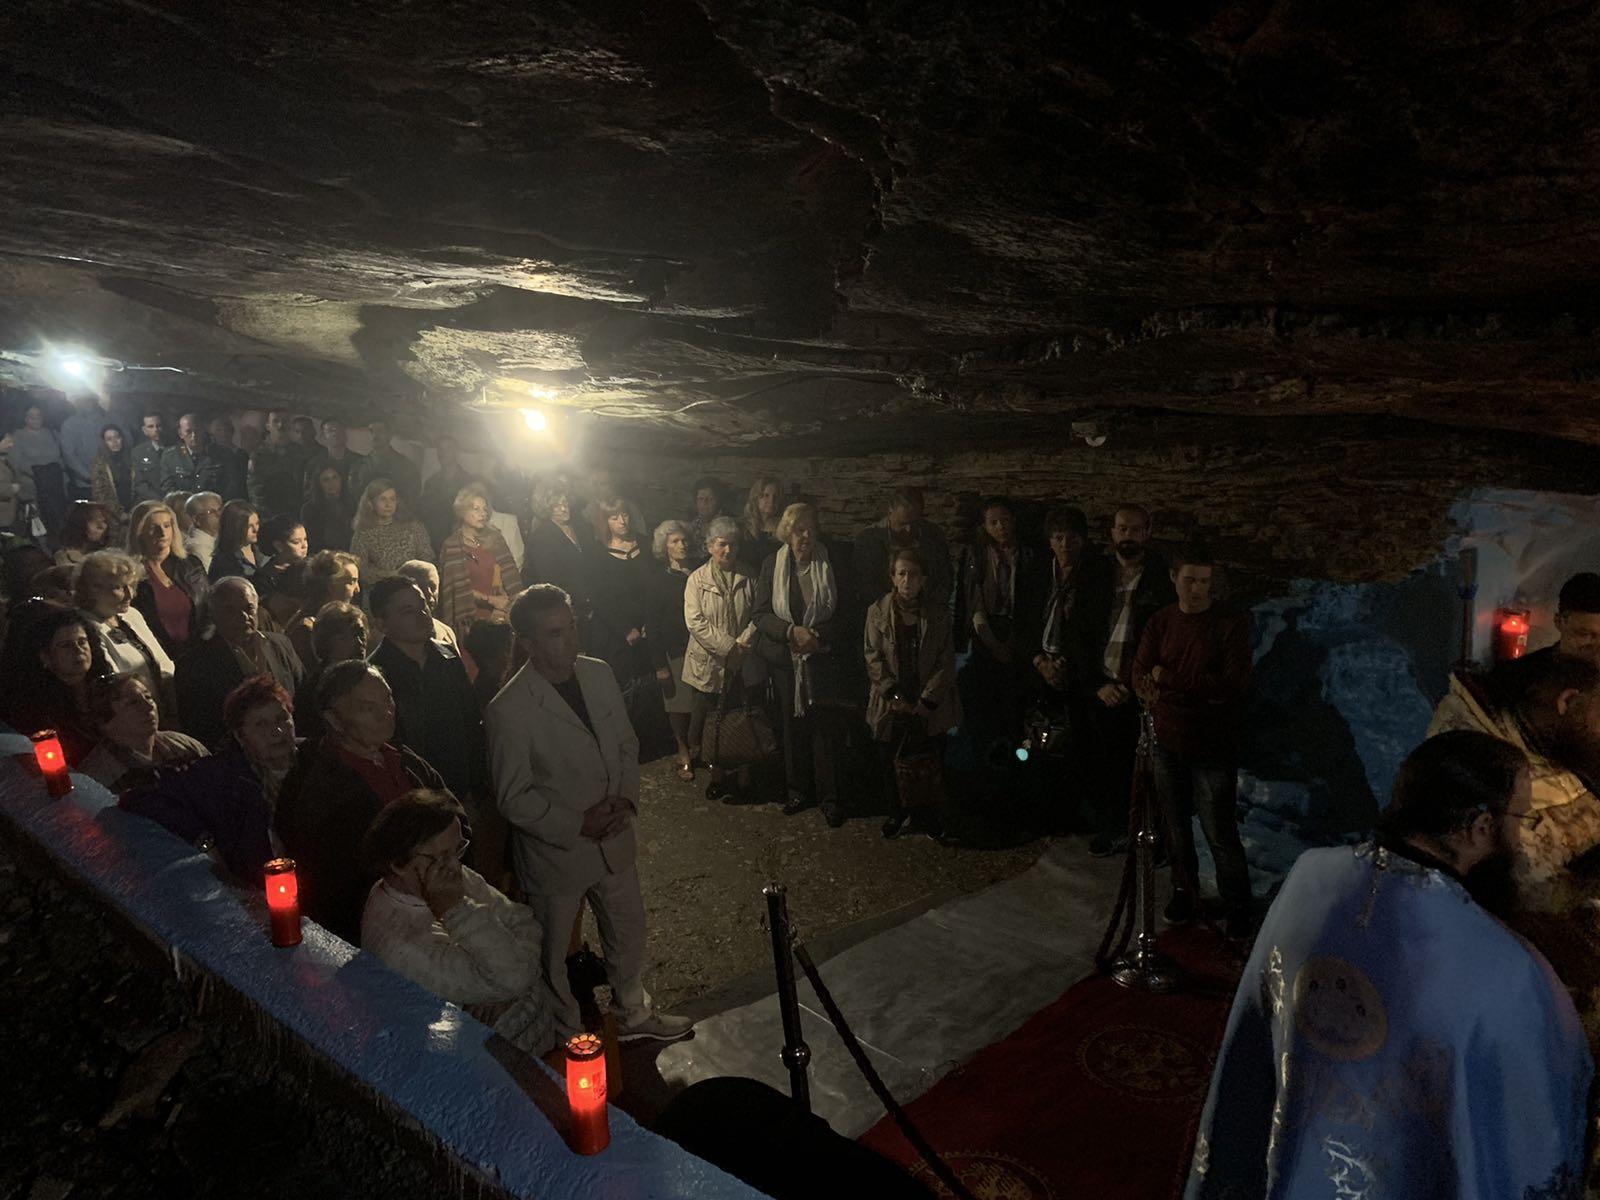 My Samos: Ένα blog για τη Σάμο: ΦΩΤΟΡΕΠΟΡΤΑΖ: Το πανηγύρι στην Παναγία Σπηλιανή!